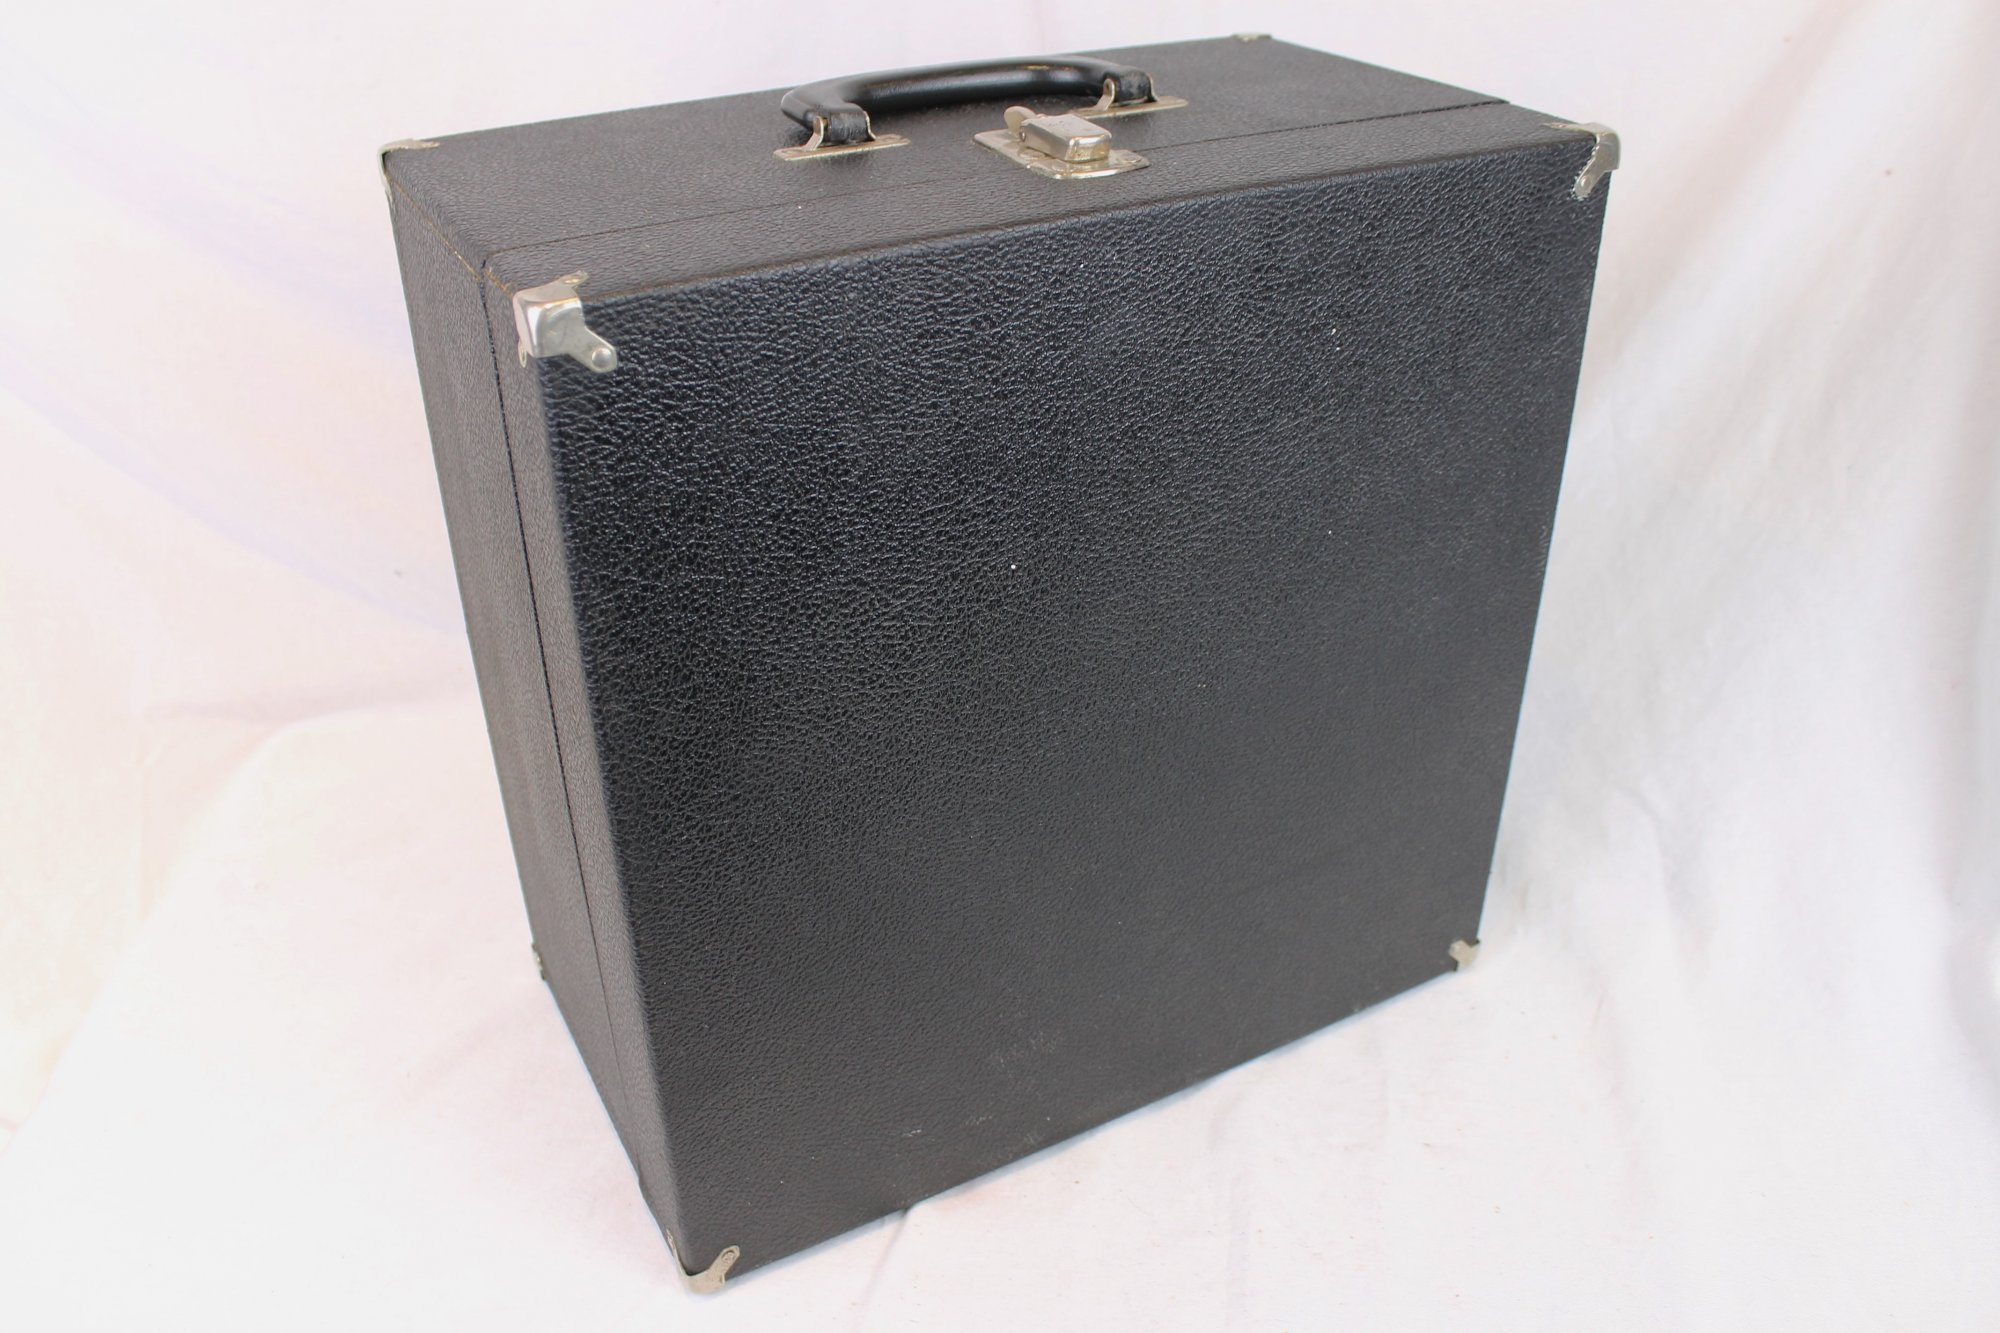 Black Accordion Hard Case 14.25 x 14.25 x 8 (36 cm x 36cm x 20cm)